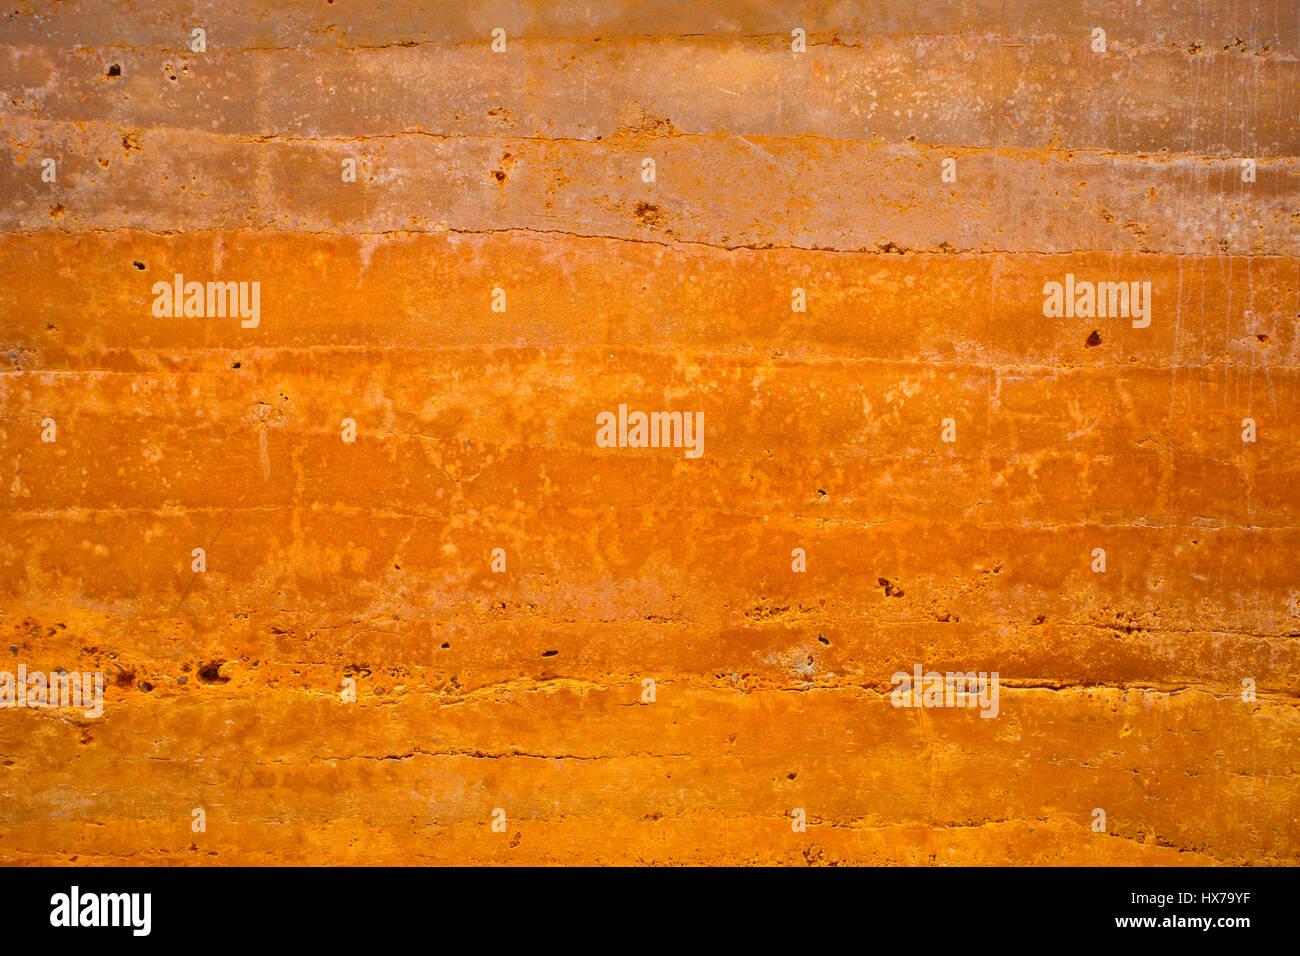 Grungy vintage orange polished concrete background texture - Stock Image